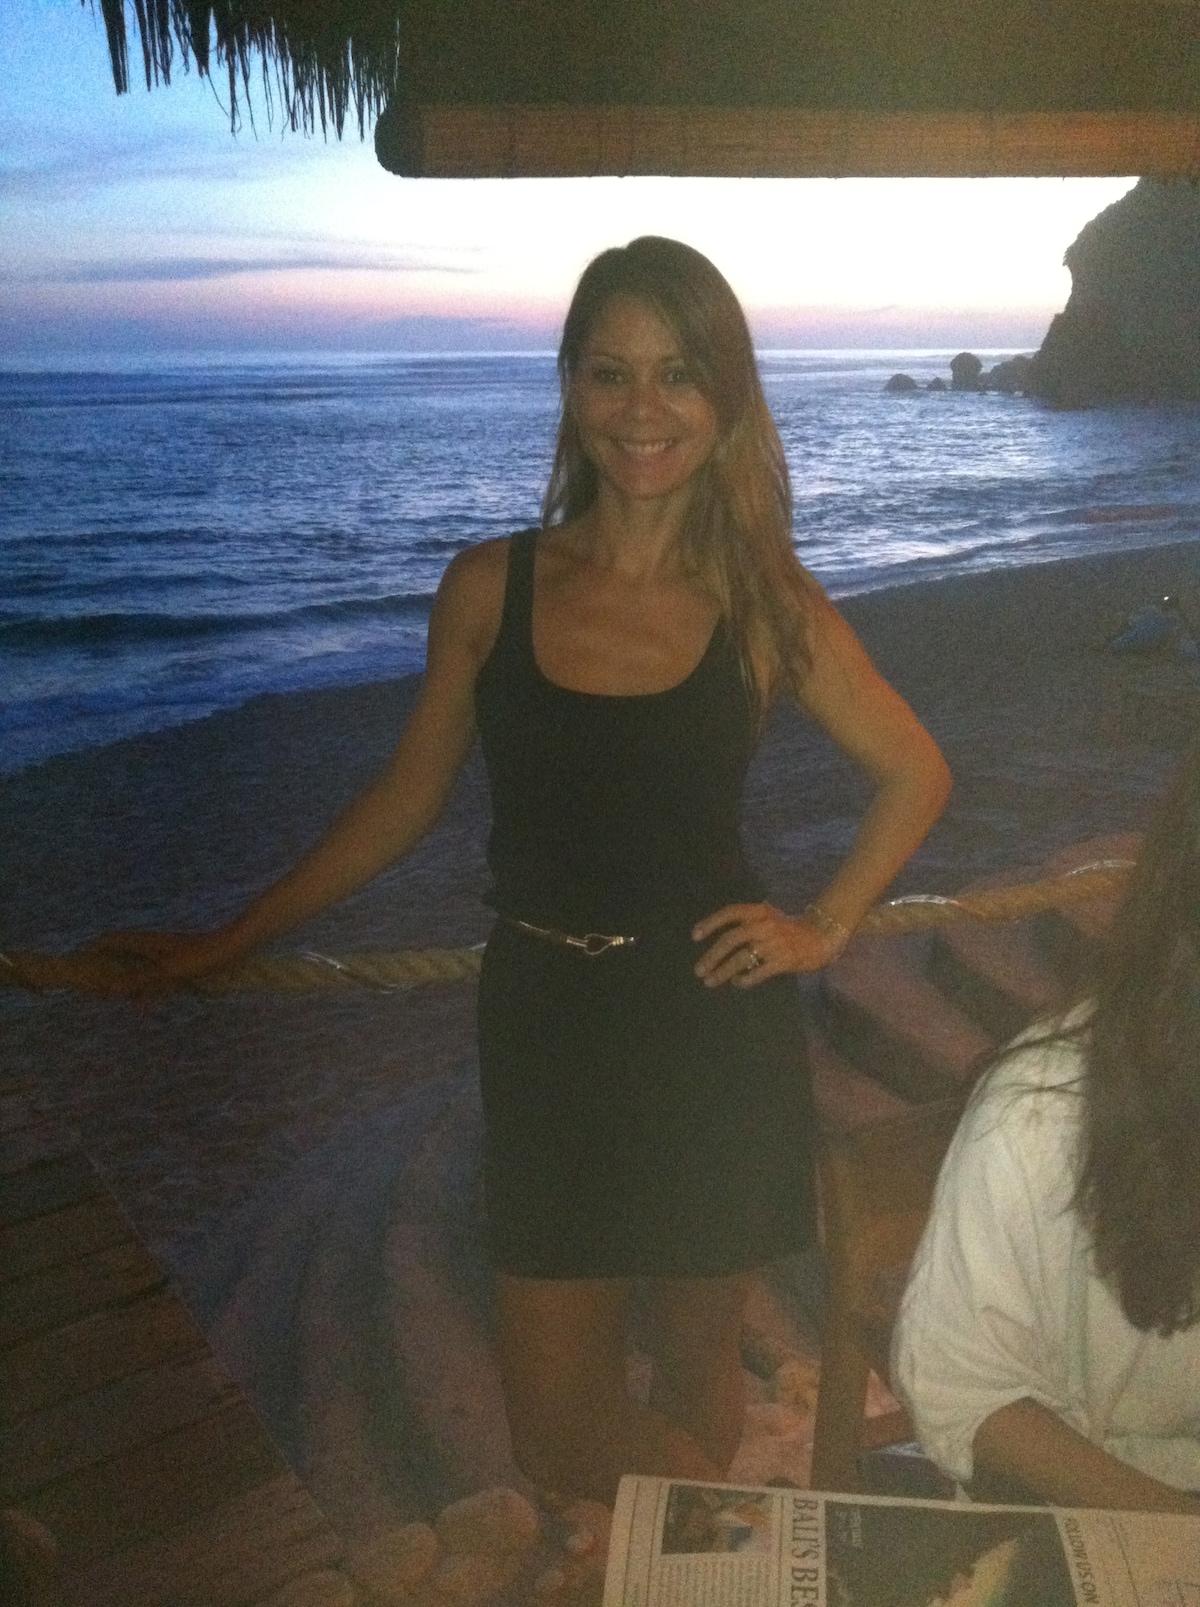 Hi, I'm Vi. I came to beautiful Bali with my famil